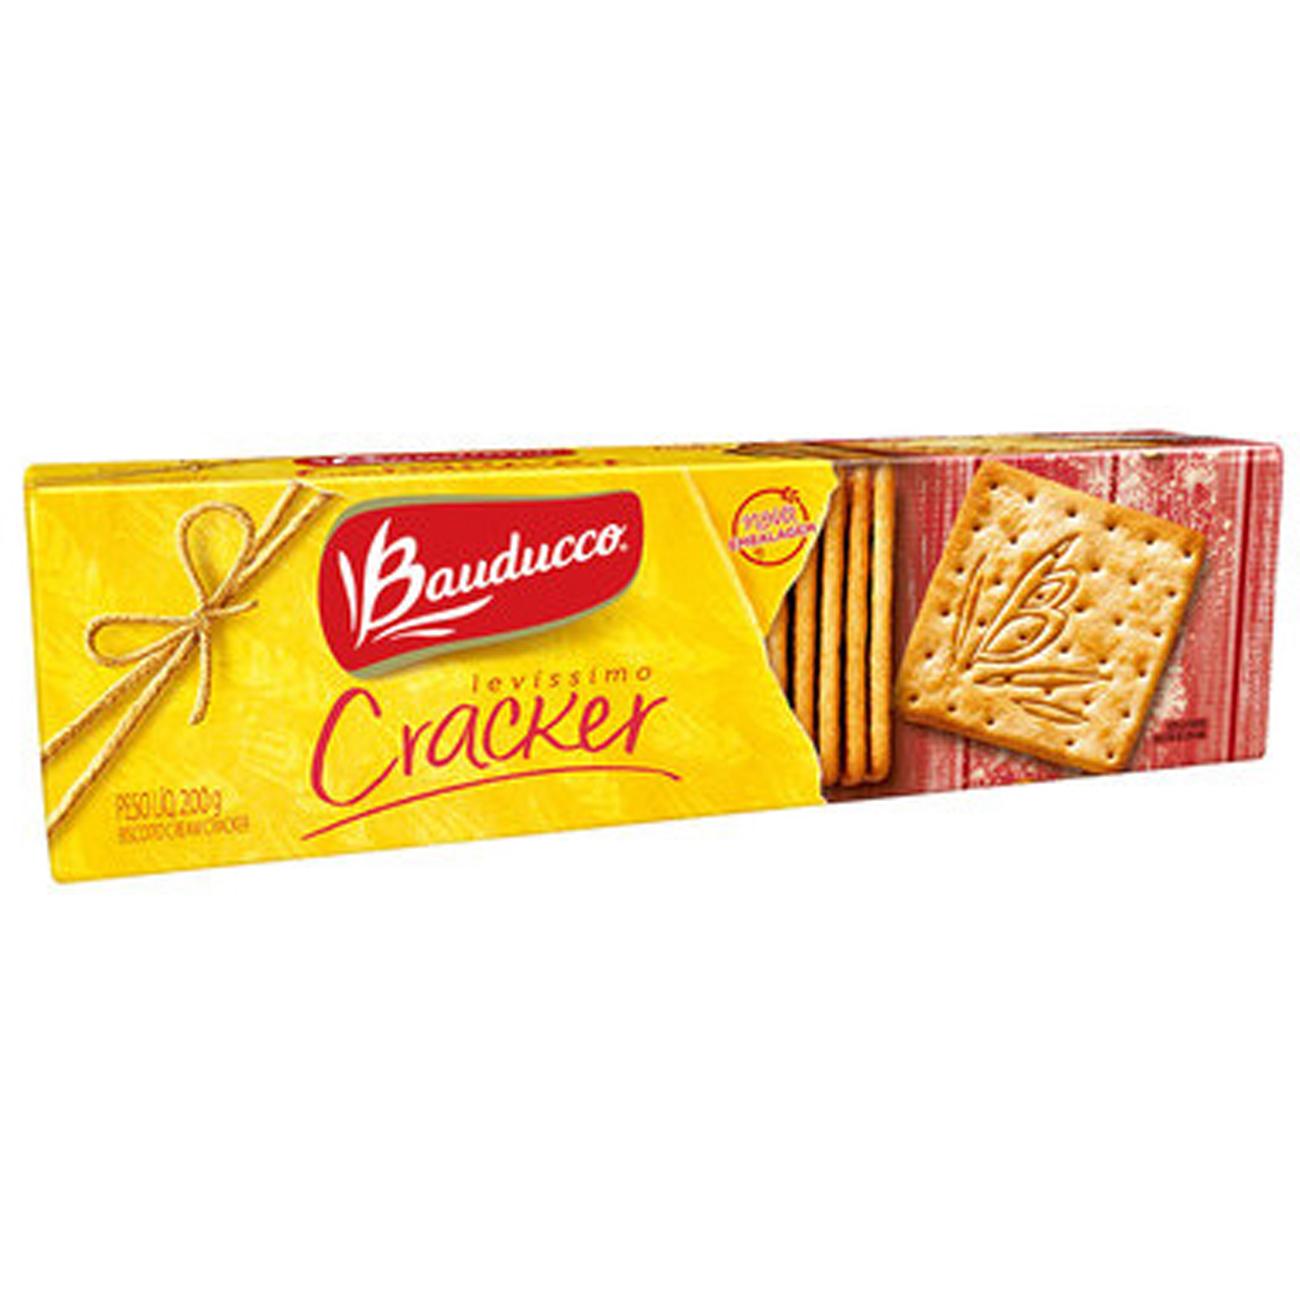 Biscoito Bauducco Levissimo Cracker 200G